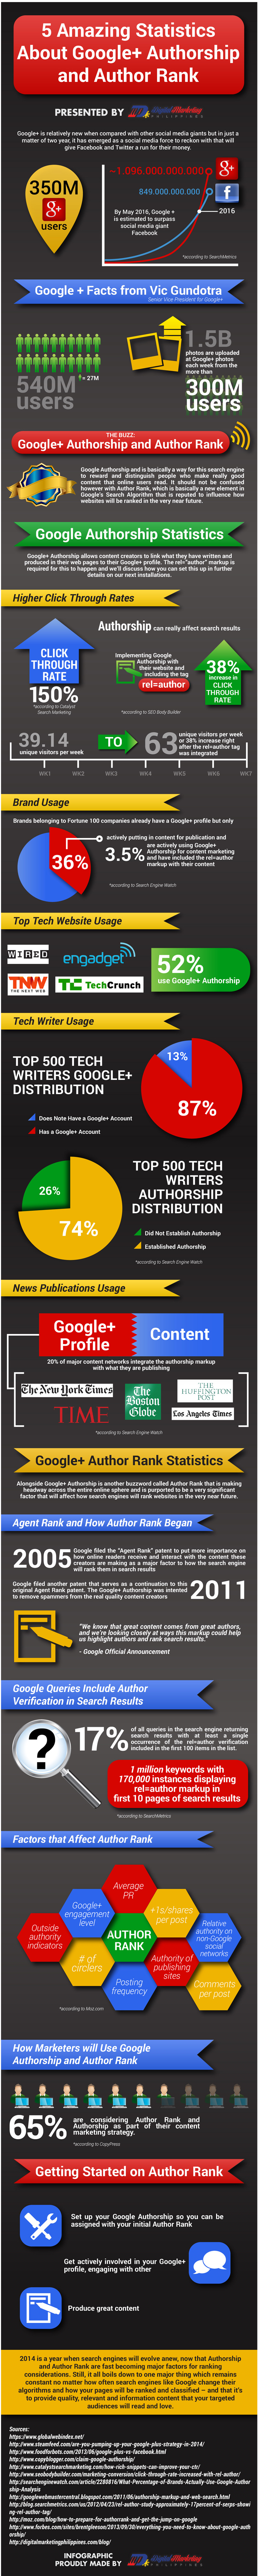 infographie-authorship-authorrank